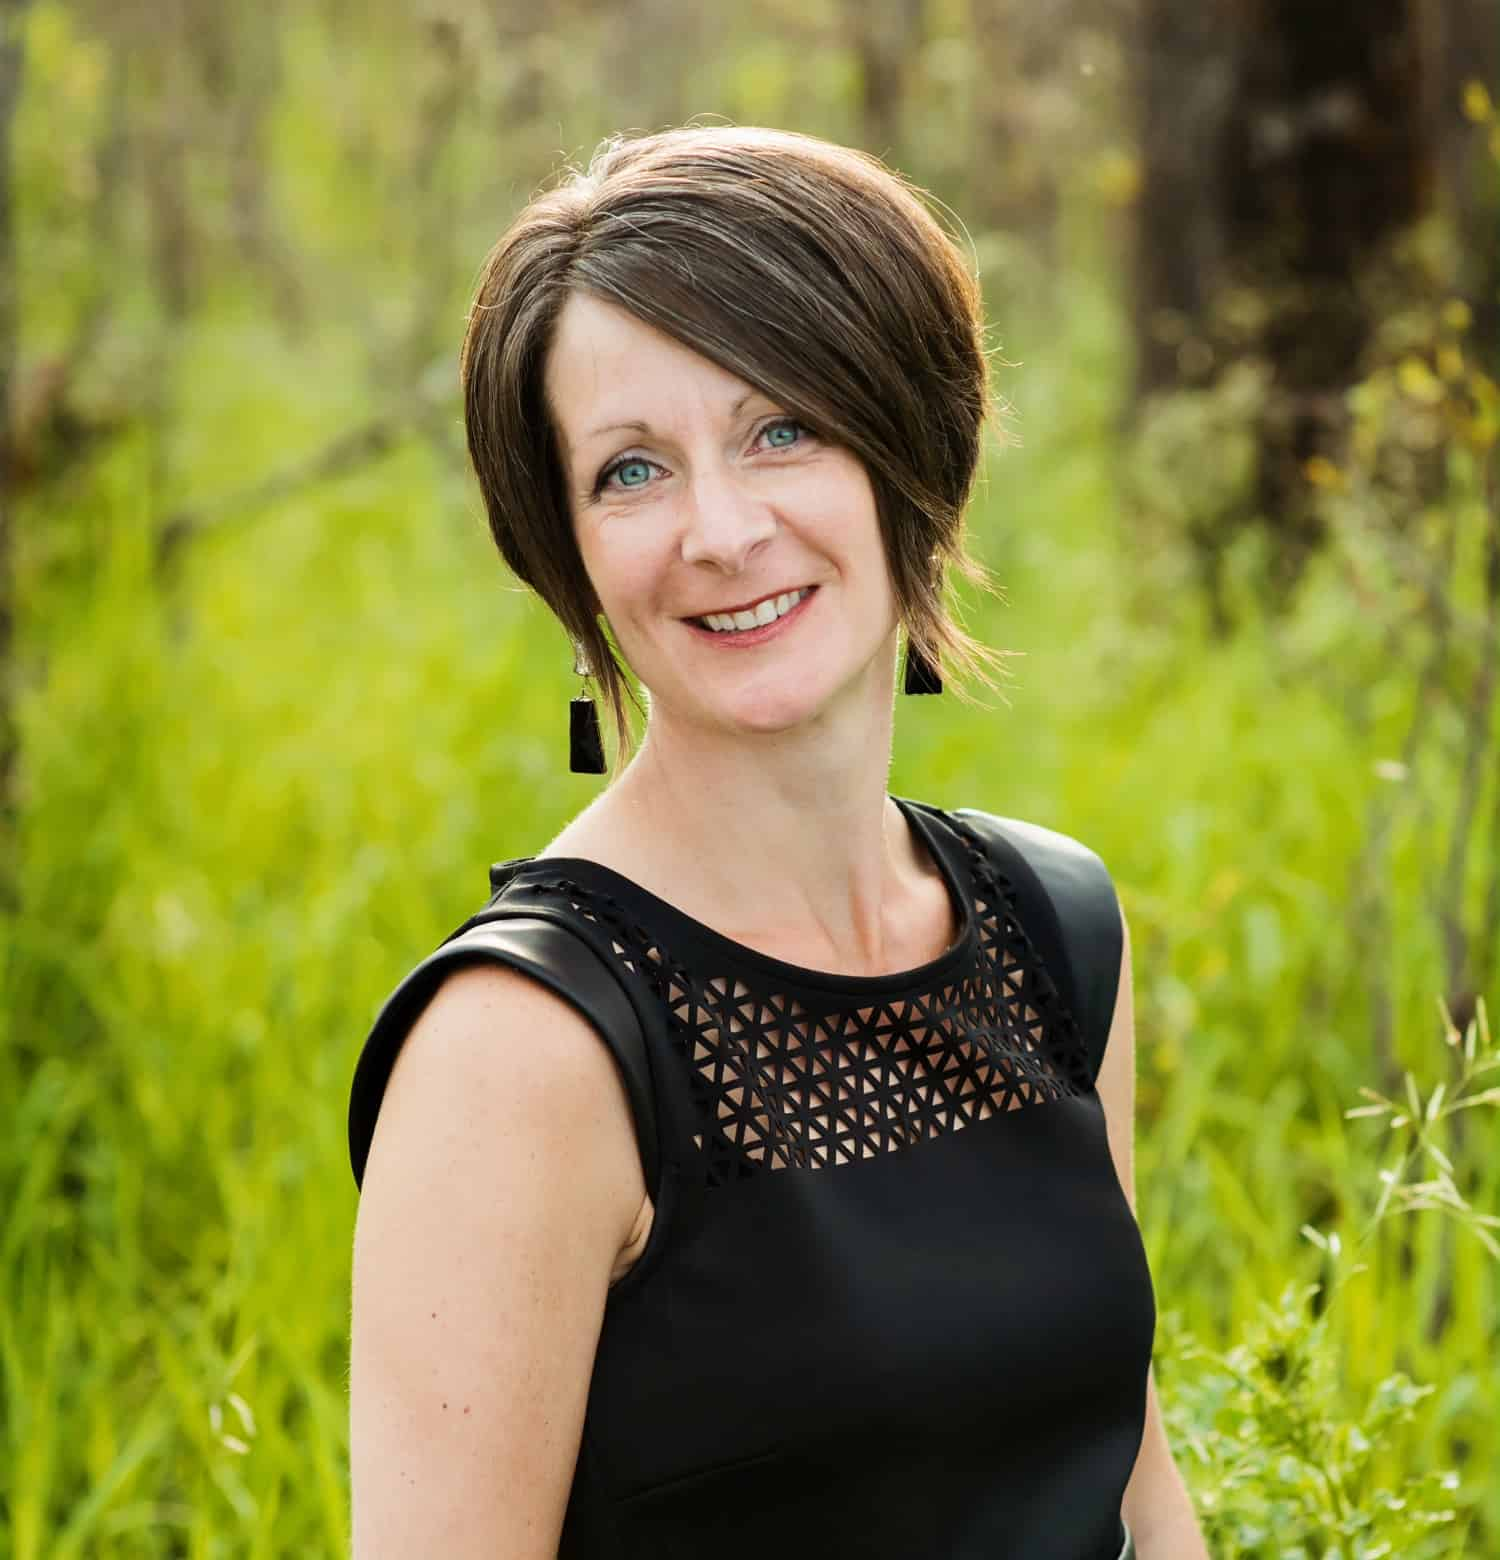 Kelly Beattie |  Transformational Change Agent, Facilitator & Keynote Speaker